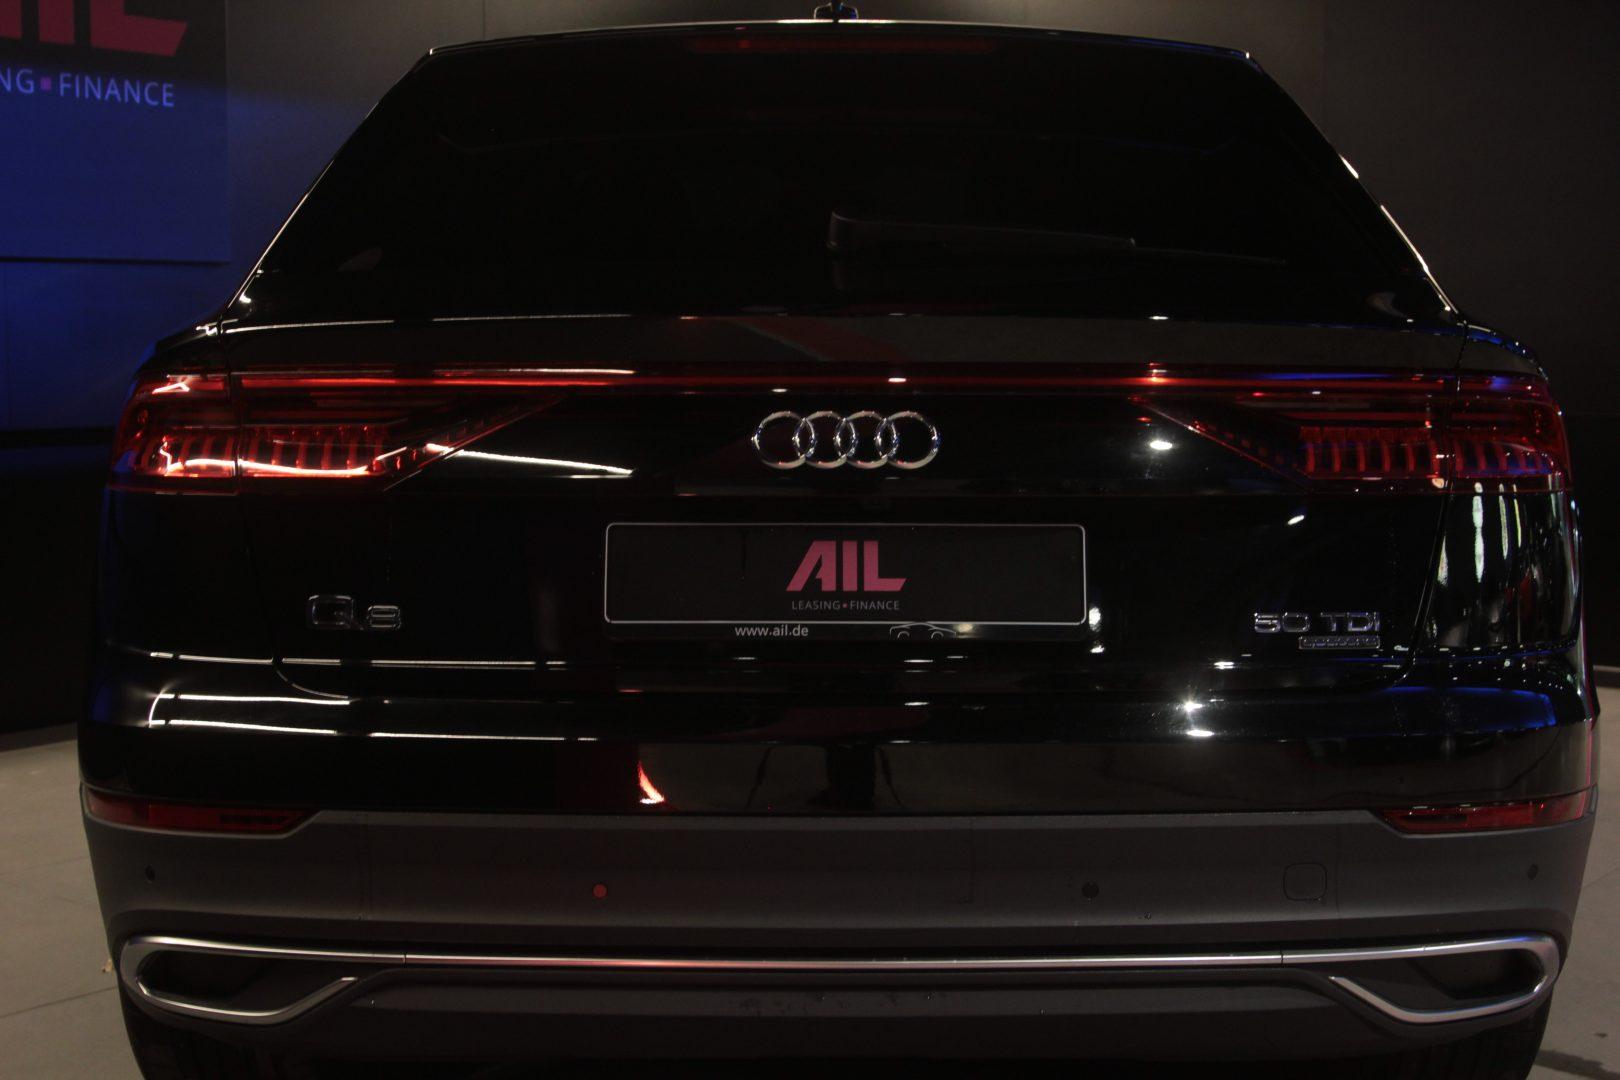 AIL Audi Q8 50TDI  S-Line  Panorama  12